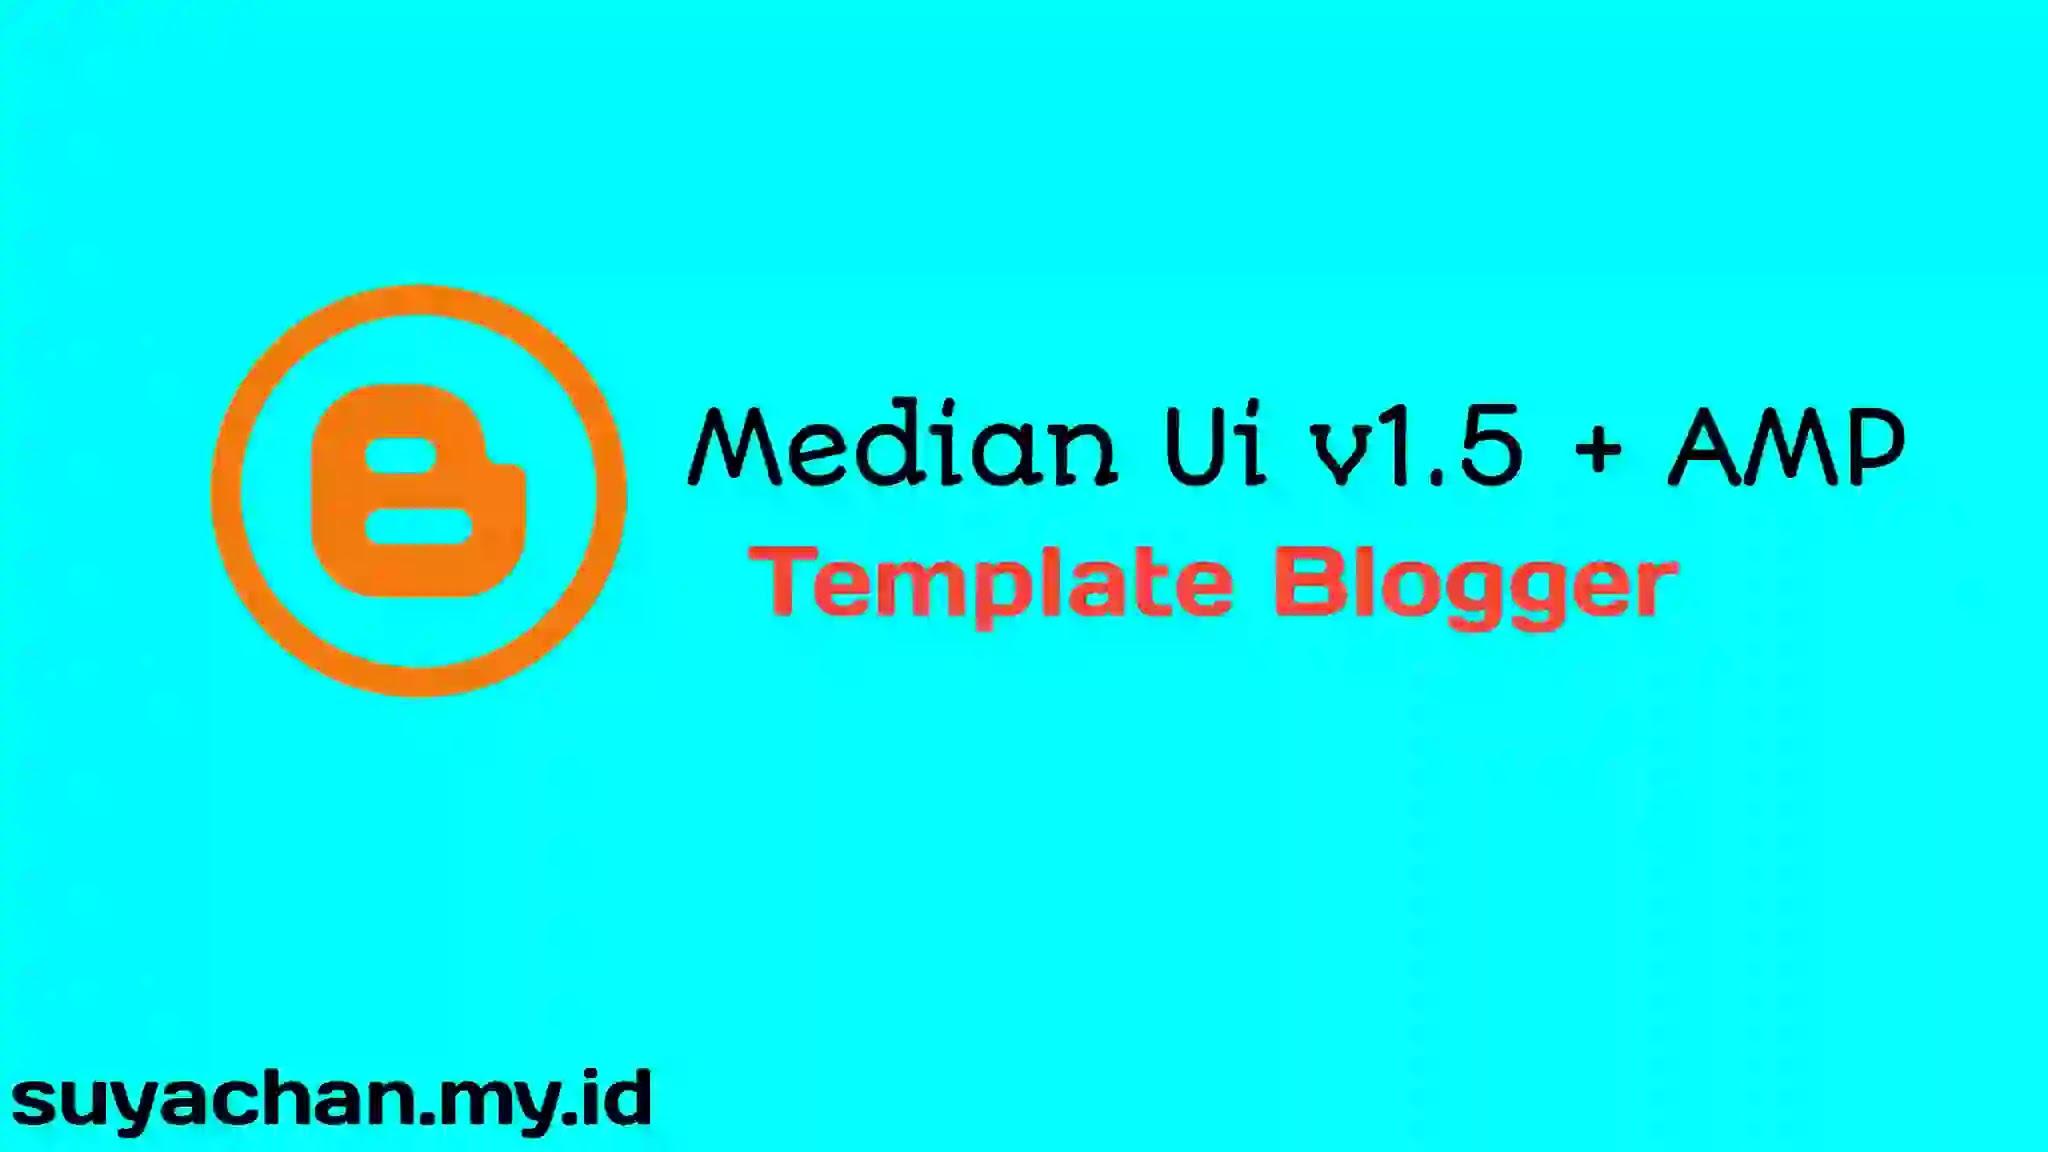 Median Ui v1.5 + AMP (Paket Lengkap)